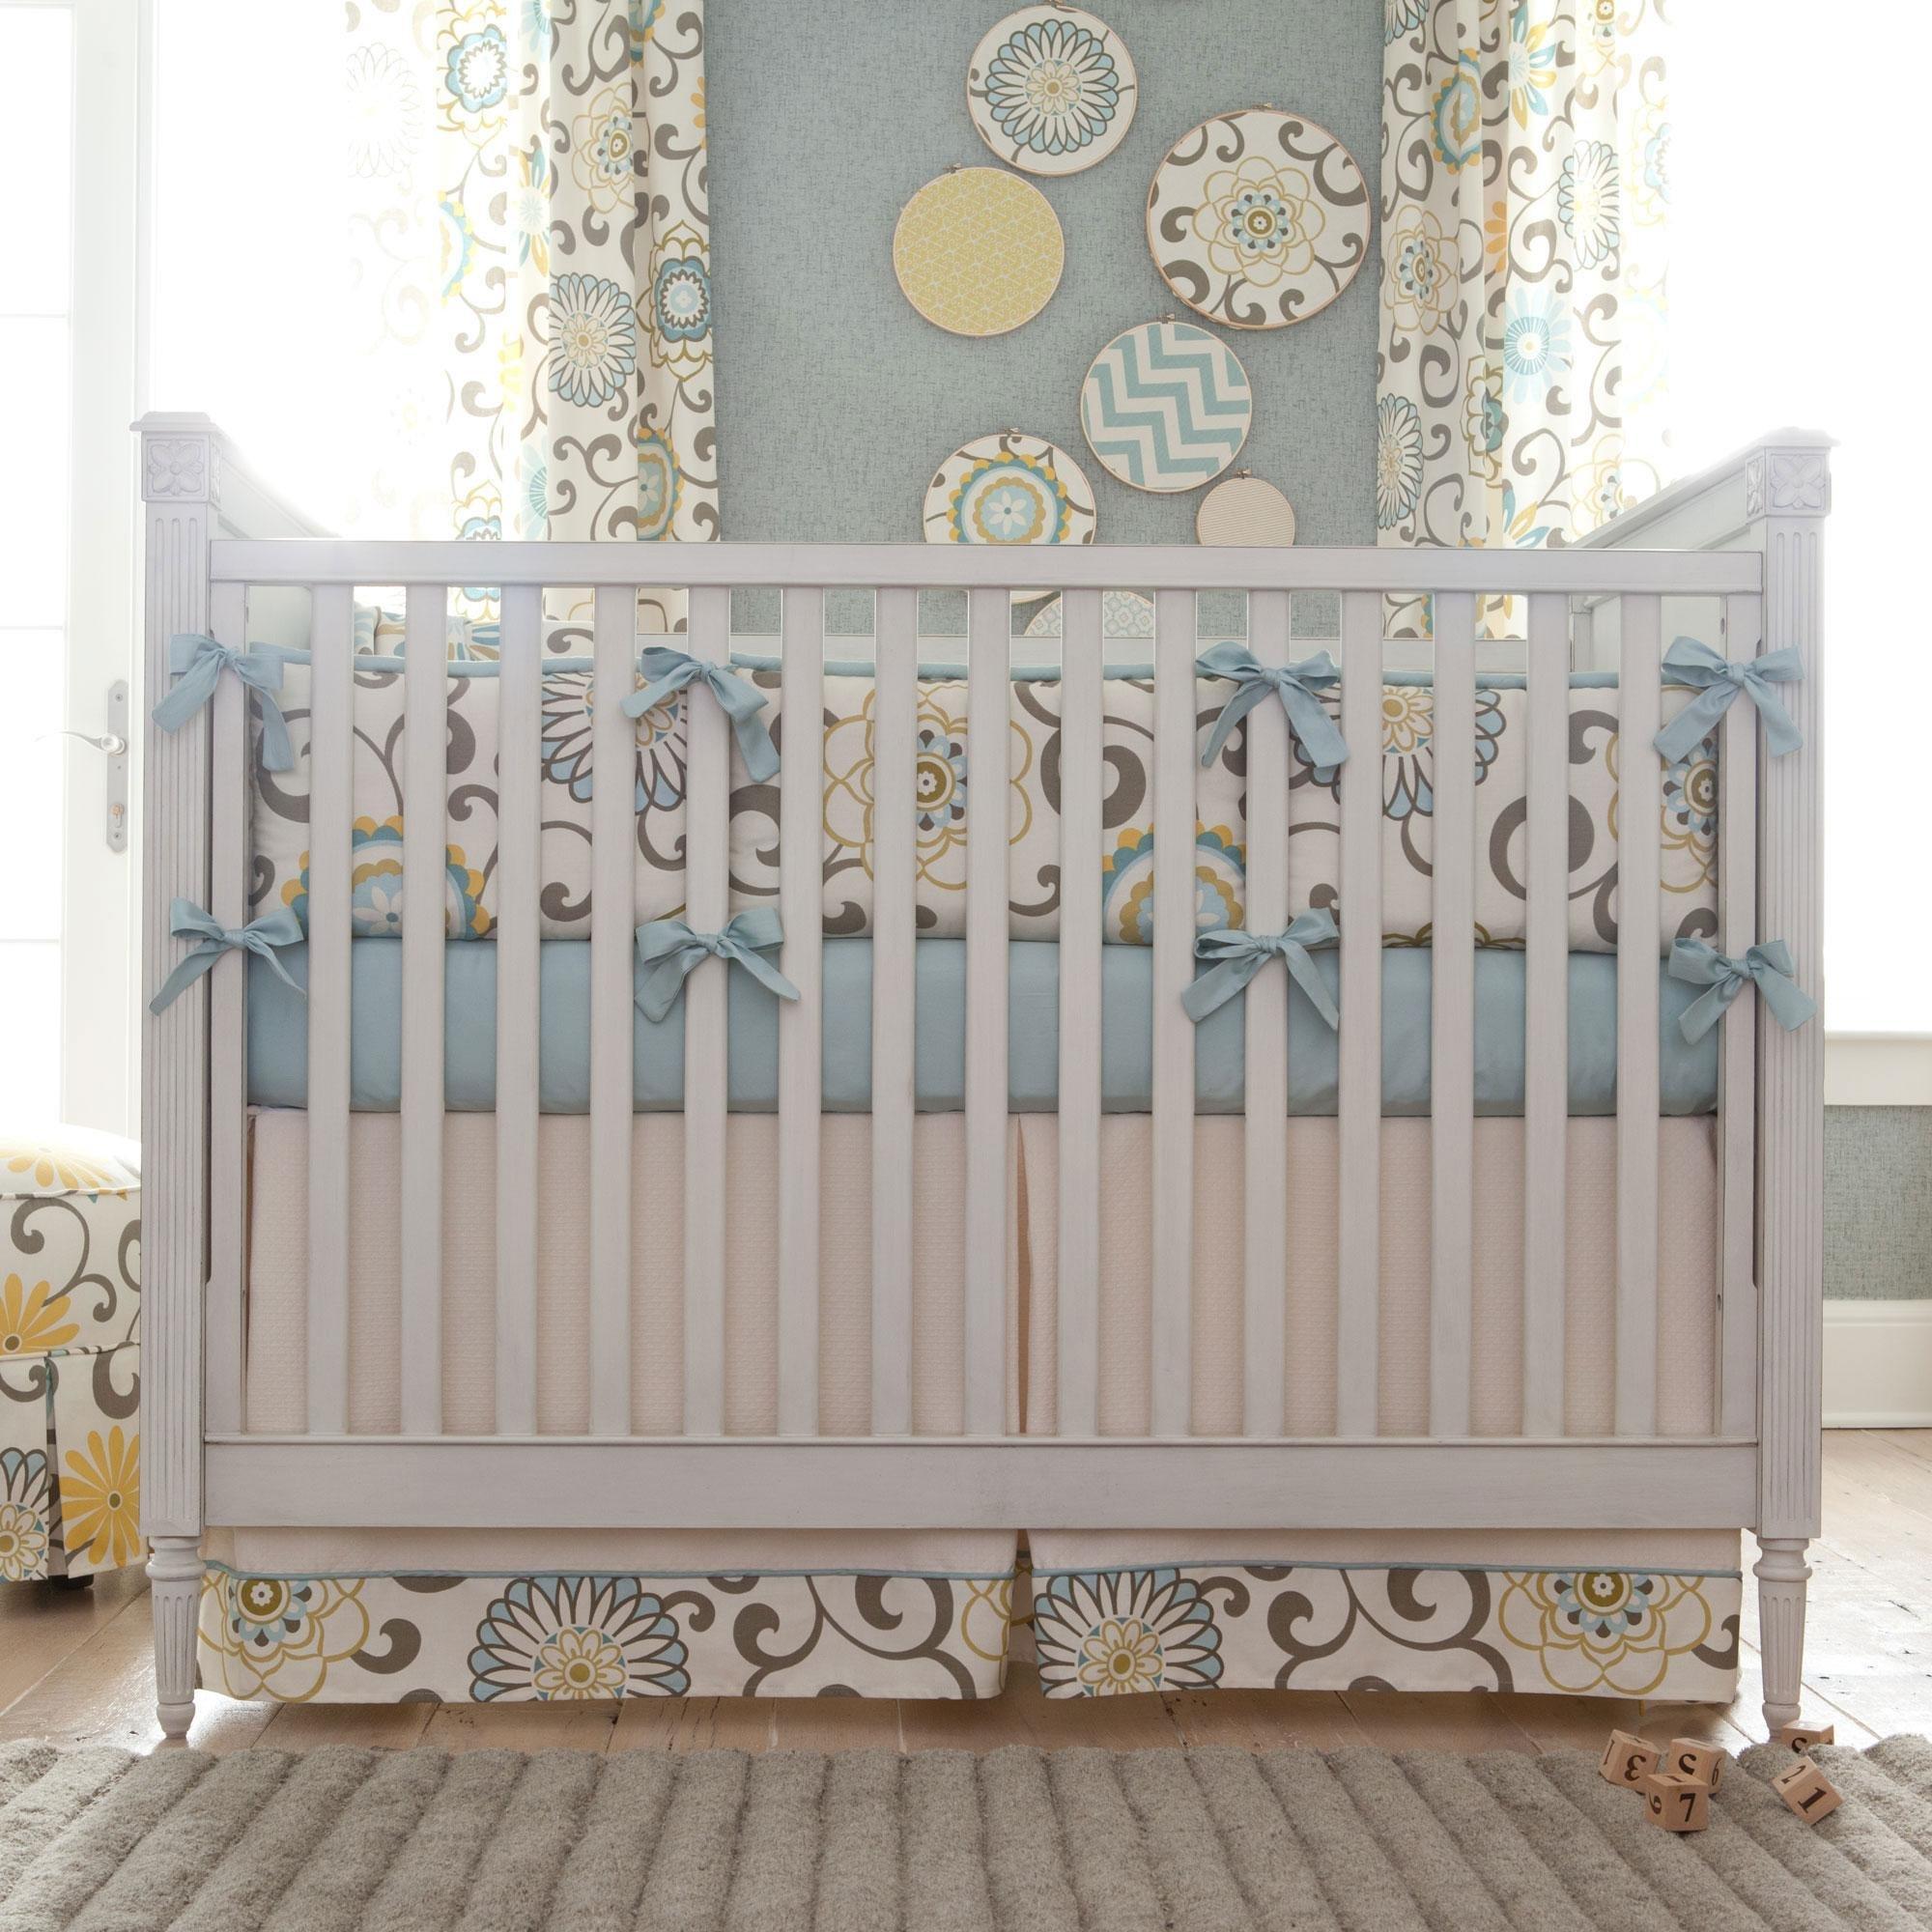 Carousel Designs Spa Pom Pon Play Crib Skirt Box Pleat 20-Inch Length